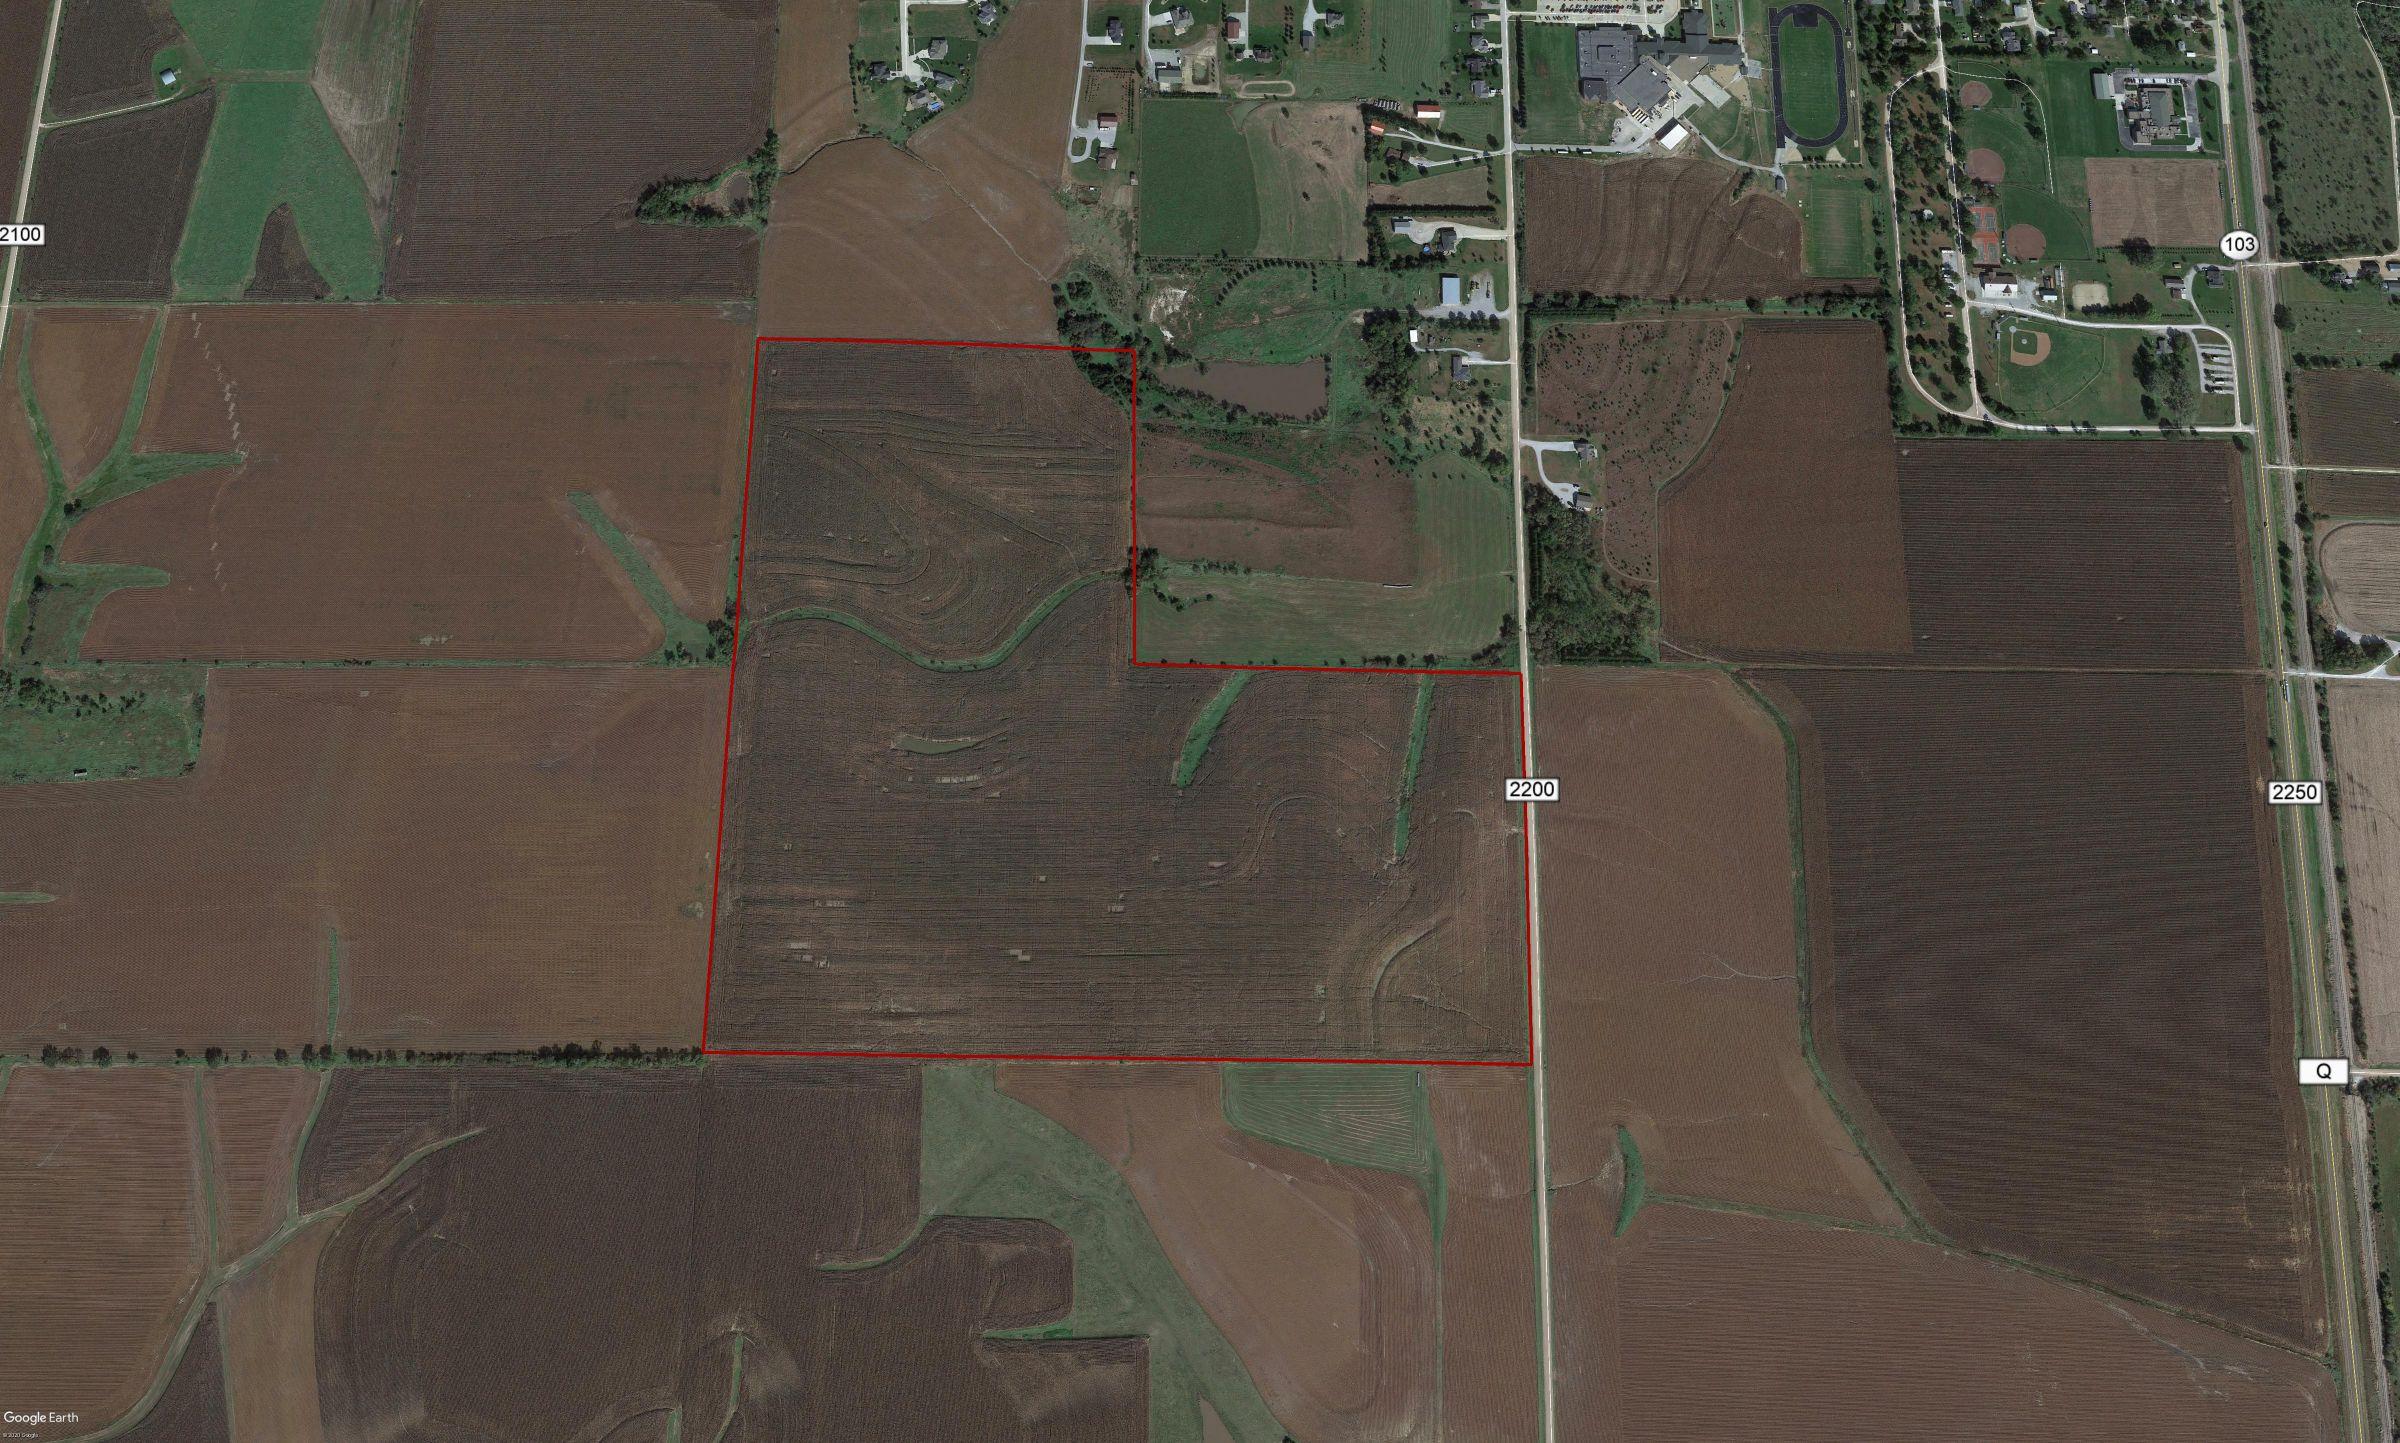 land-saline-county-nebraska-116-acres-listing-number-15166-0-2020-09-21-141638.jpg